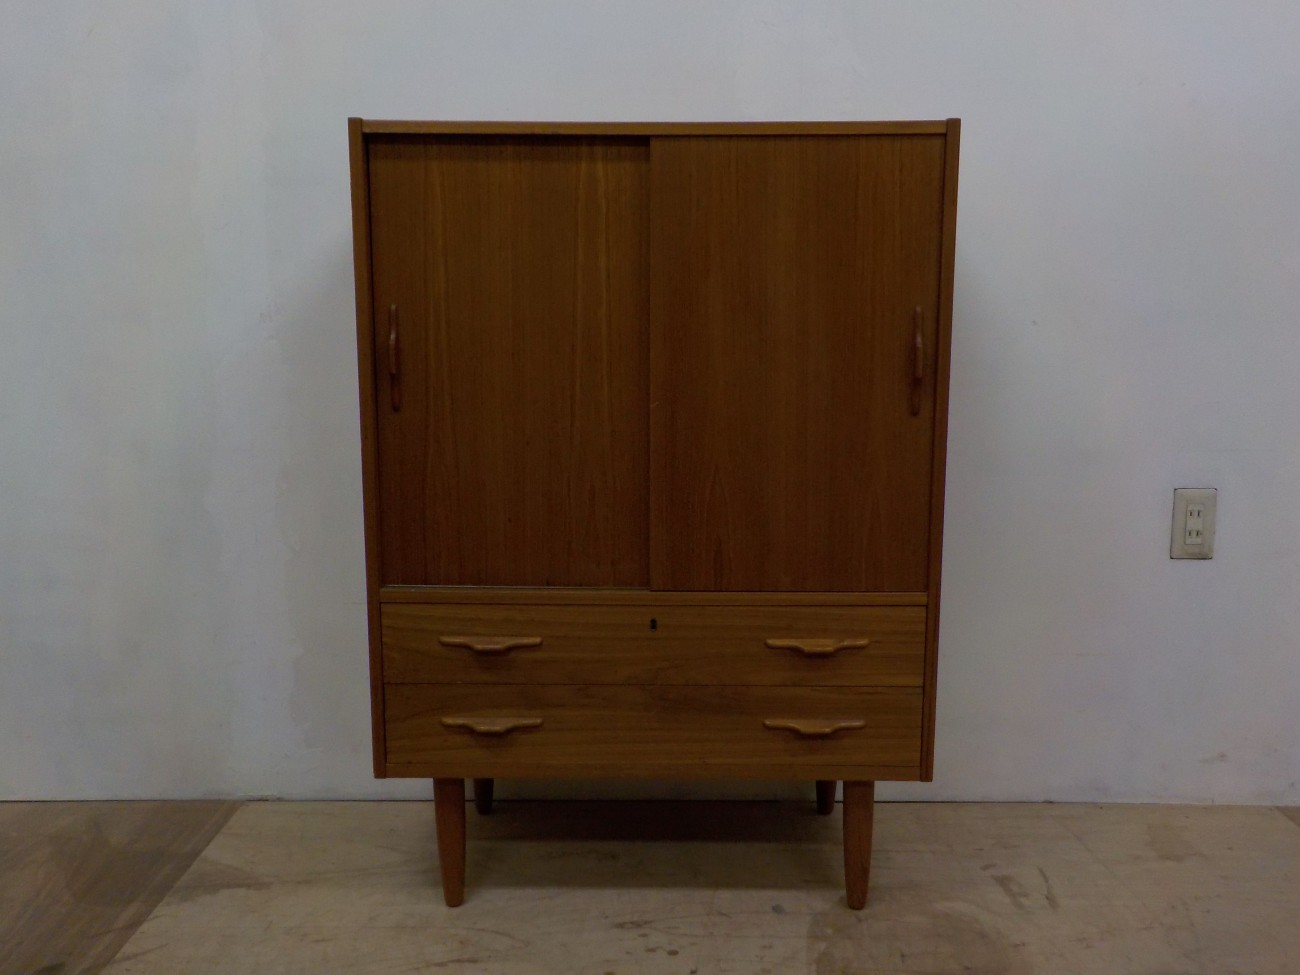 Cabinet / チーク キャビネット / stock2012-26